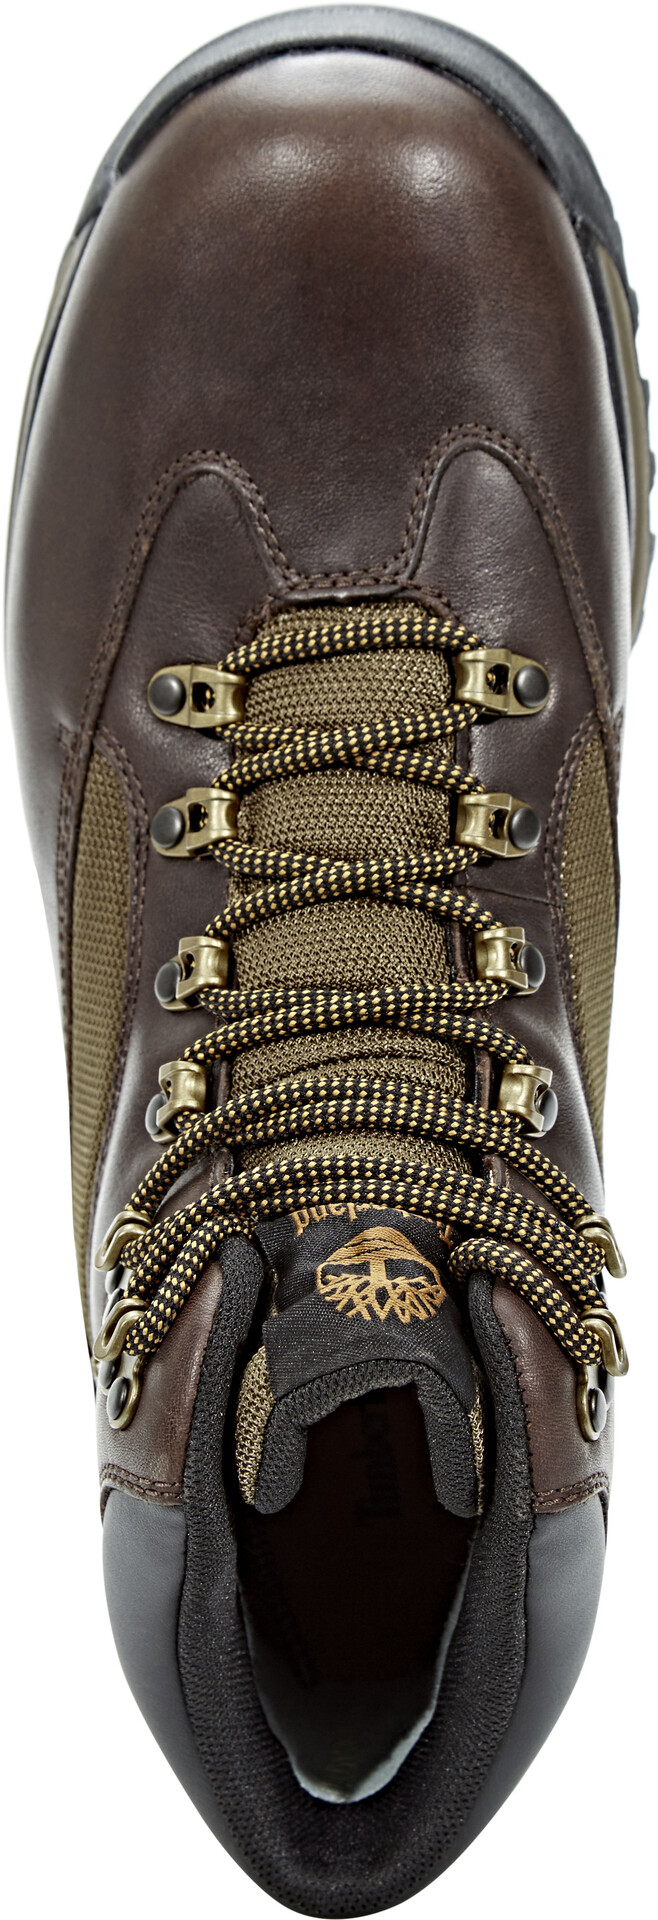 2 marron Timberland Chocorua sur Chaussures Trail GTX Homme CAMPZ eBdCxroW